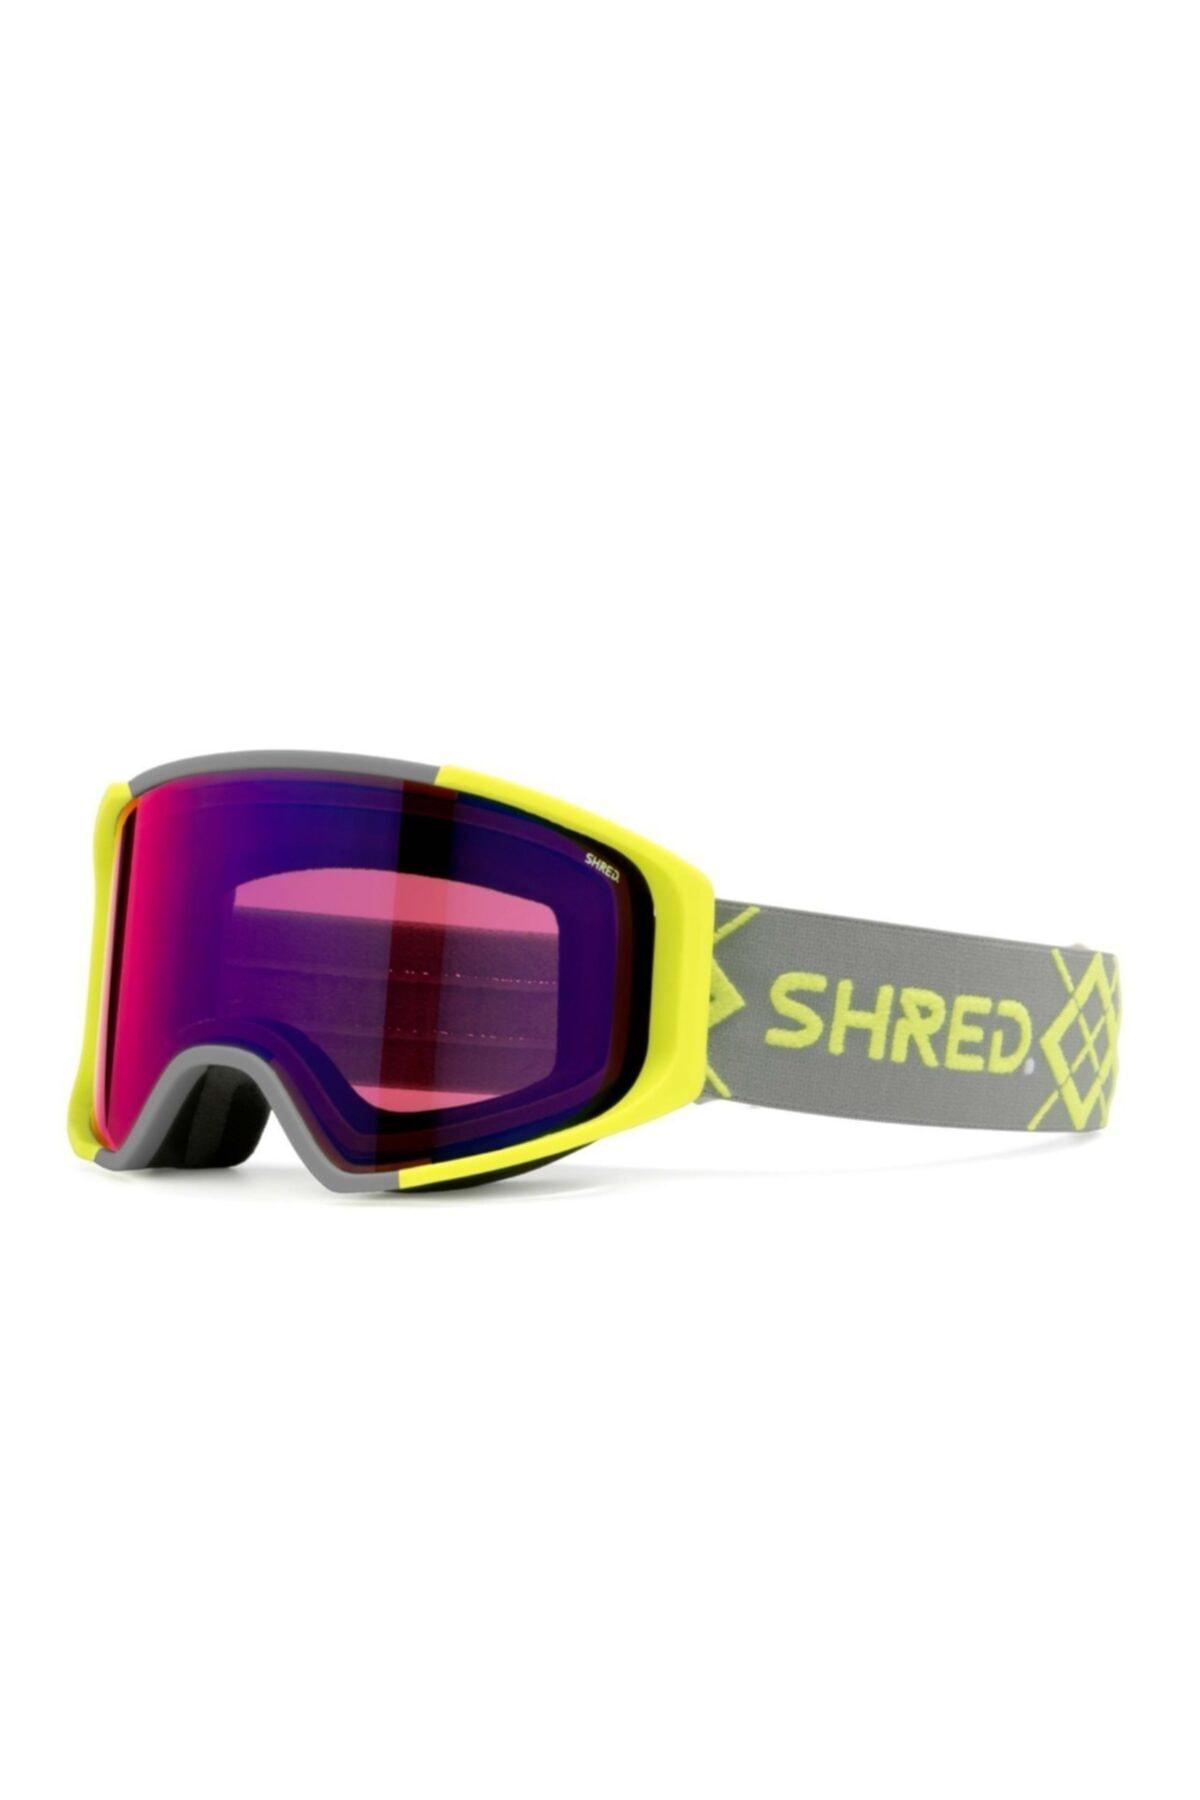 SHRED Gözlük Sımplfy Cbl Blast 1